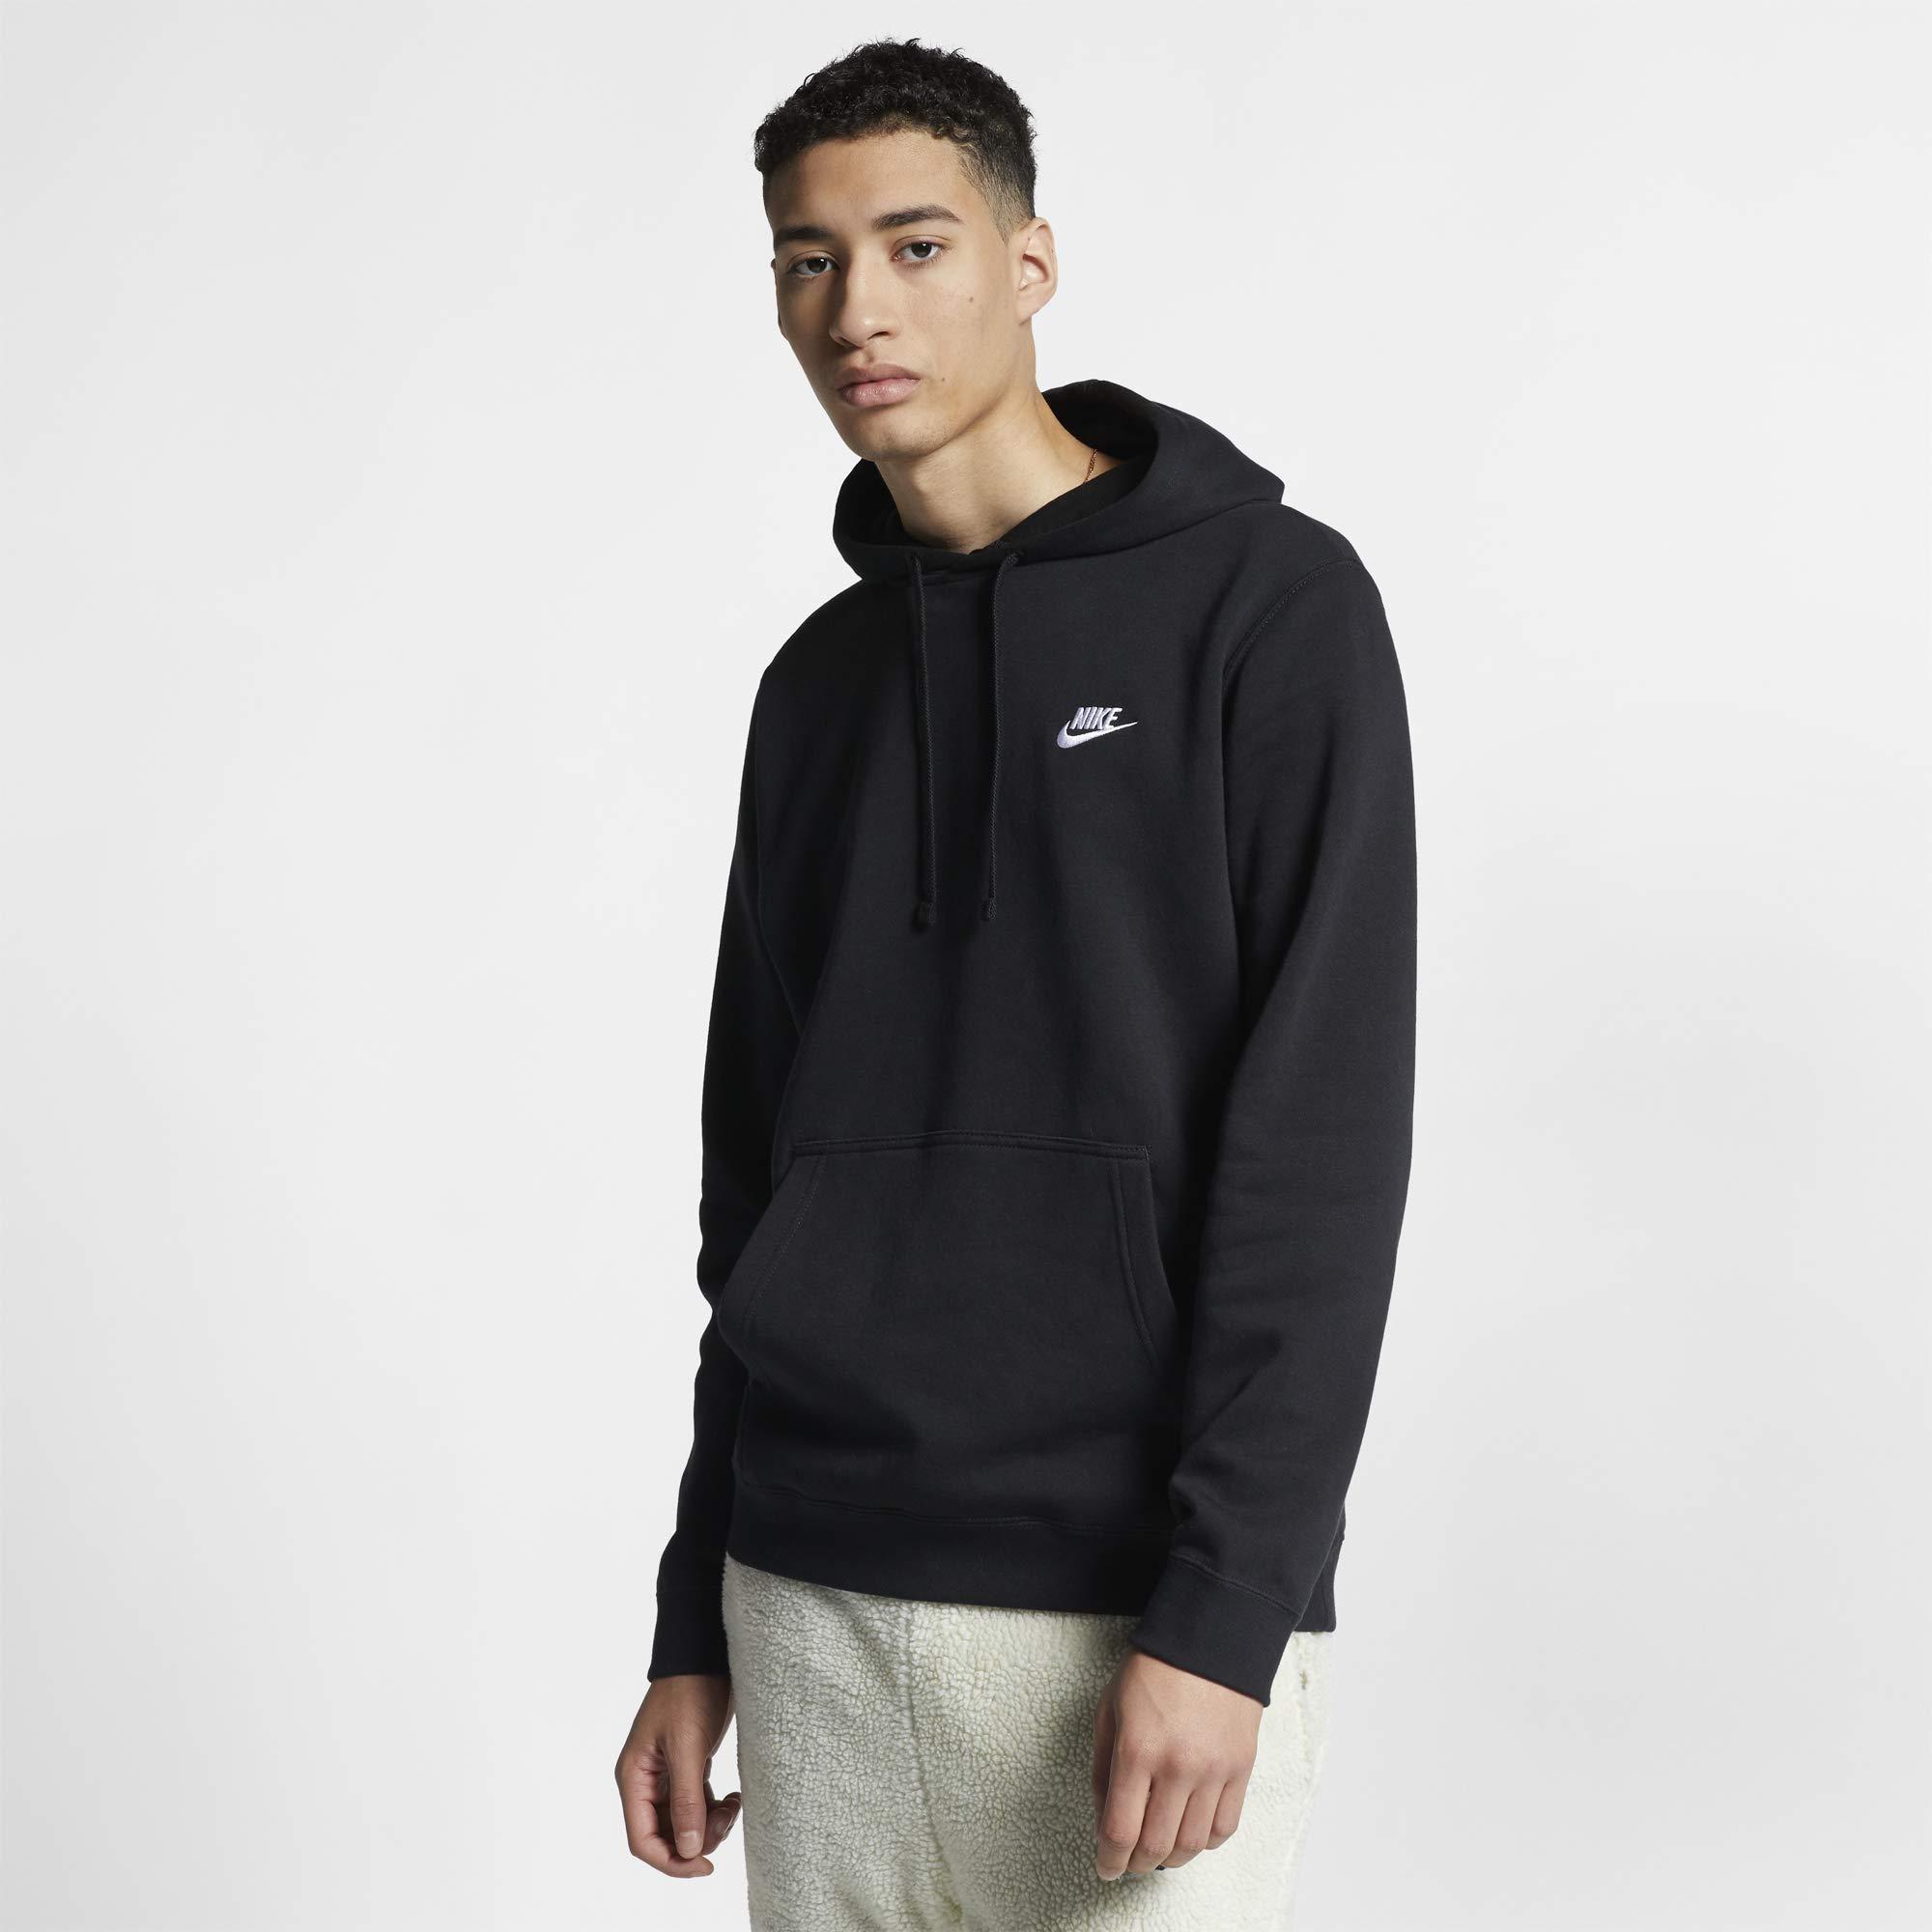 Men's Nike Sportswear Club Pullover Hoodie, Fleece Sweatshirt for Men with Paneled Hood, Black/Black/White, M